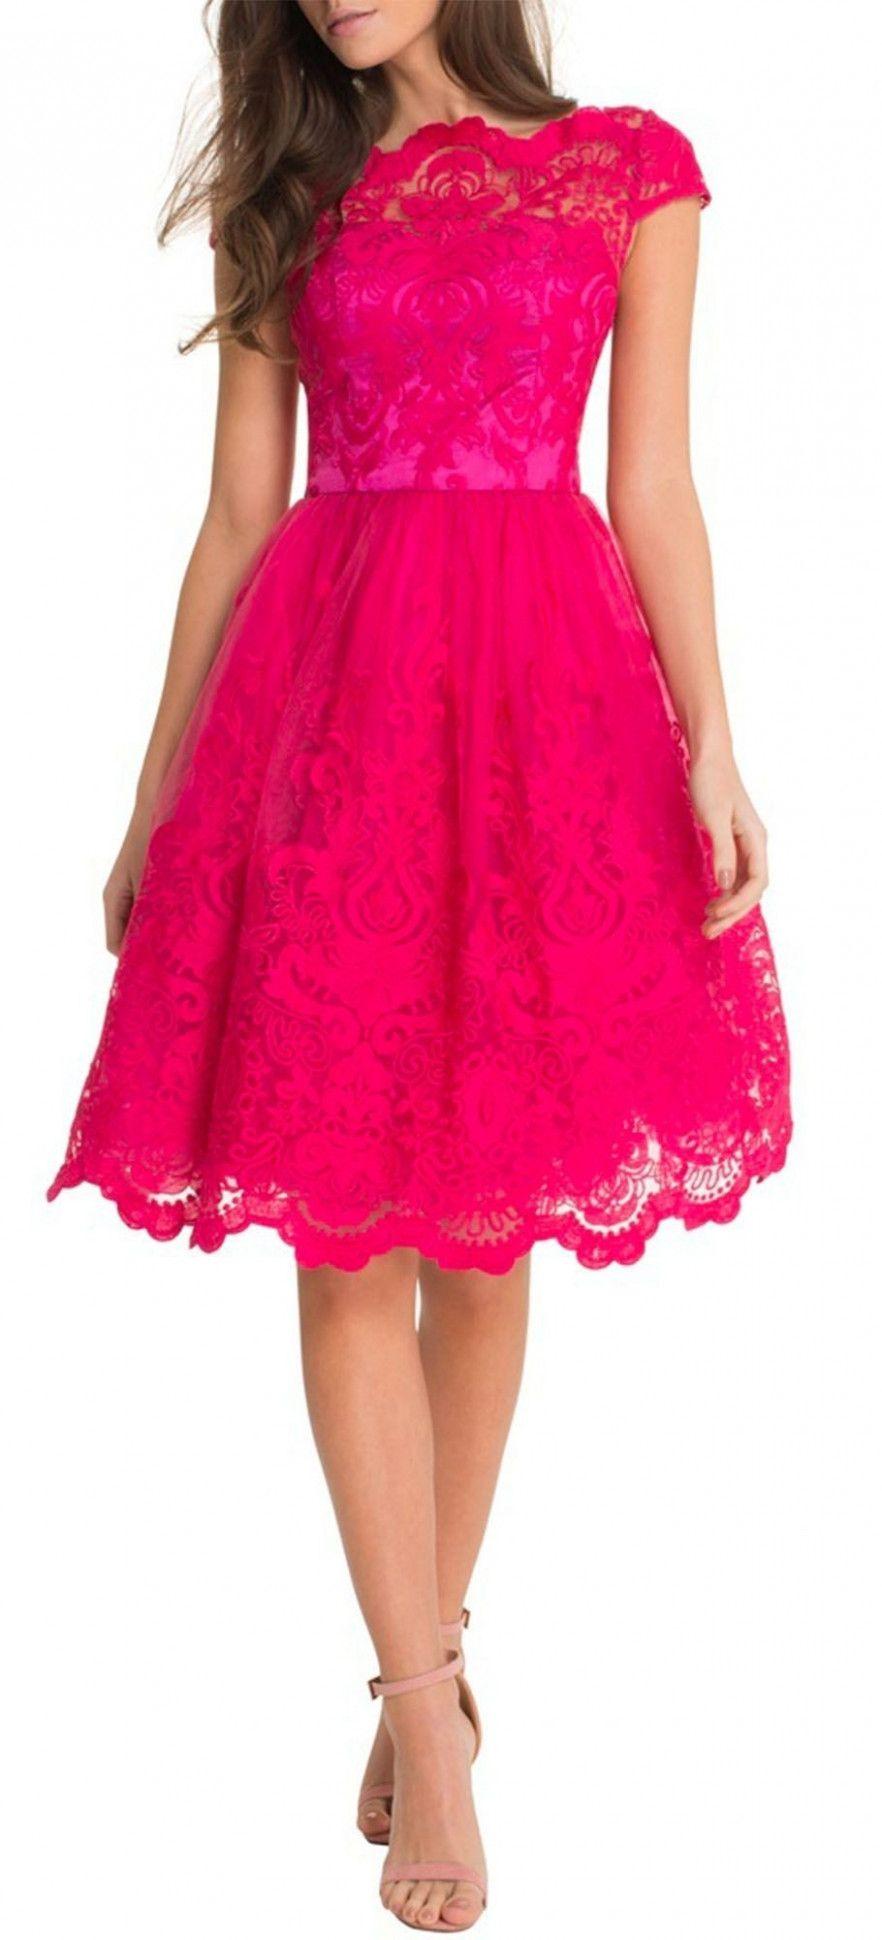 15 pinkes kleid kurz | pinkes kleid, glamouröse abendkleider